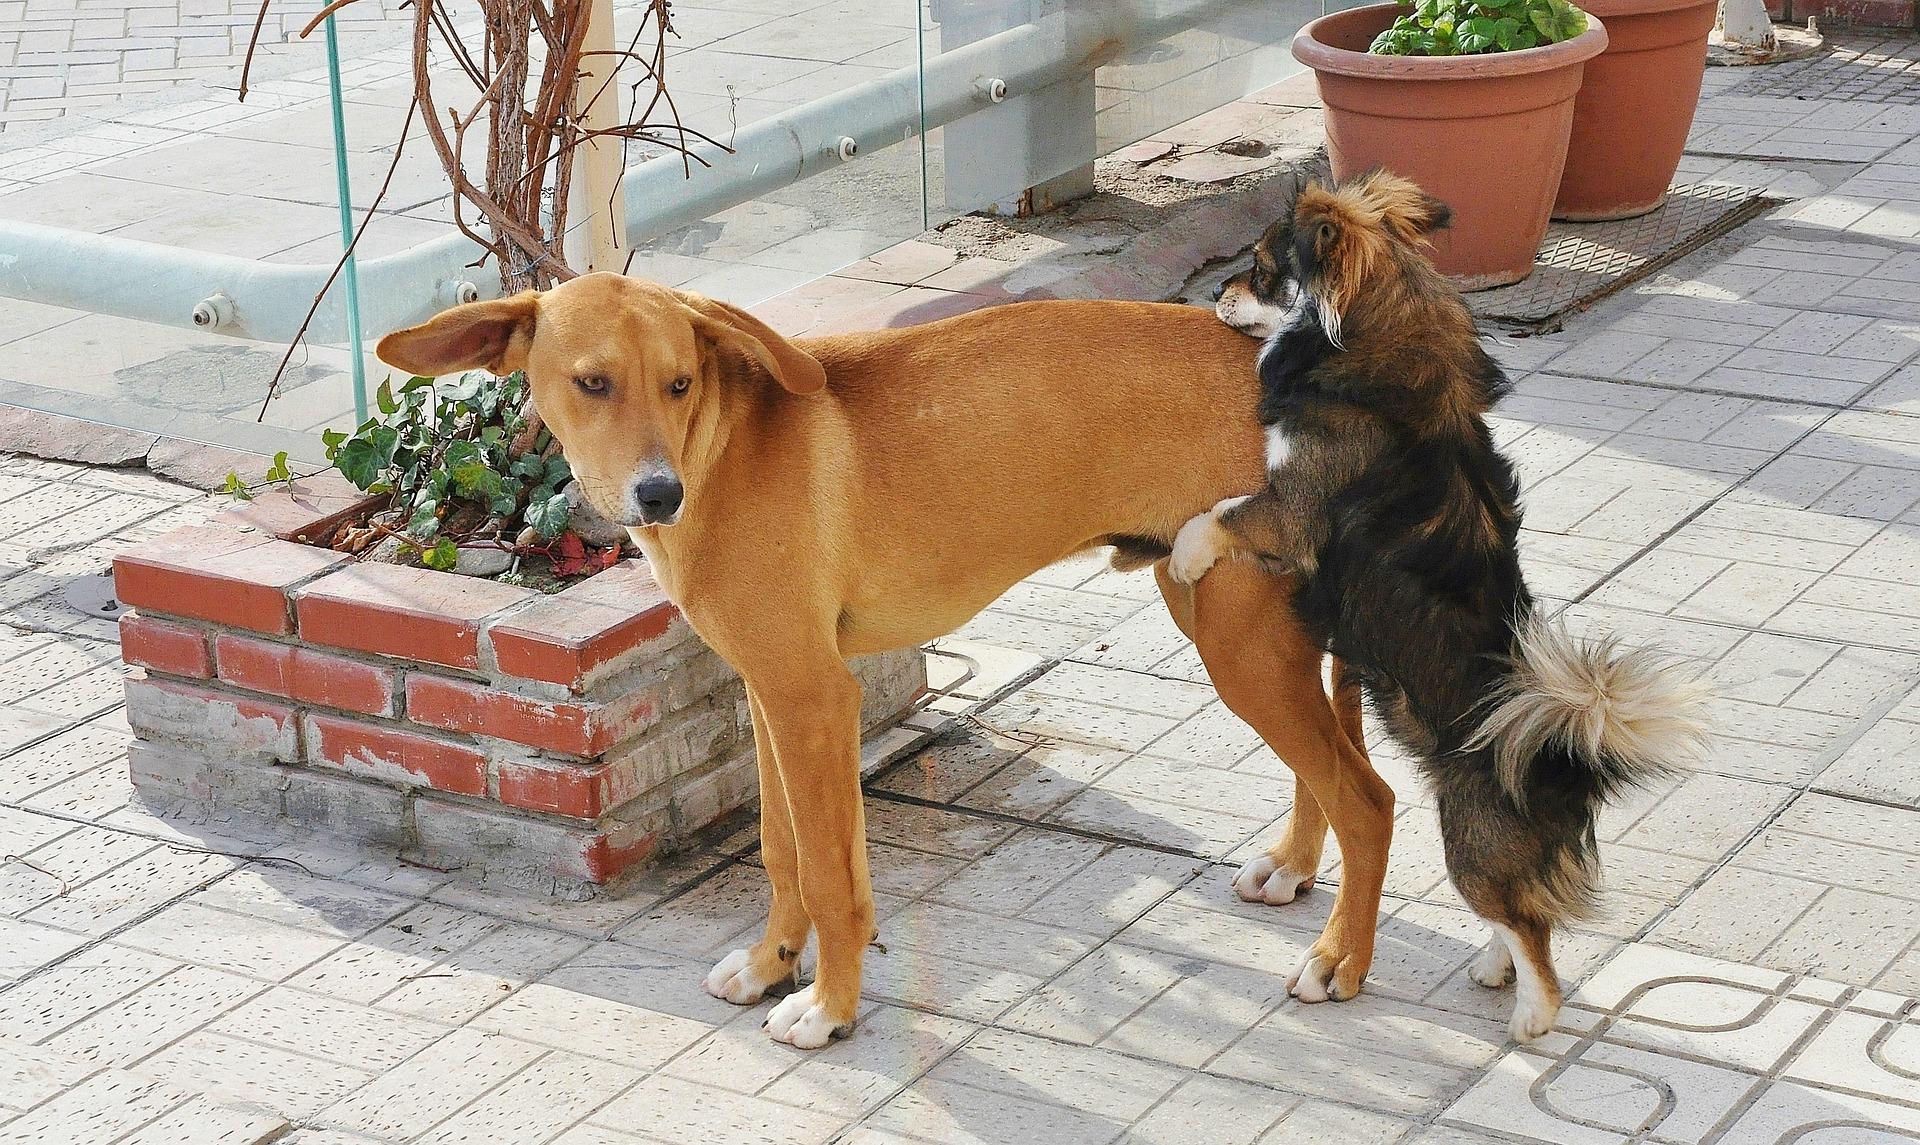 dog-606041_1920 (1).jpg